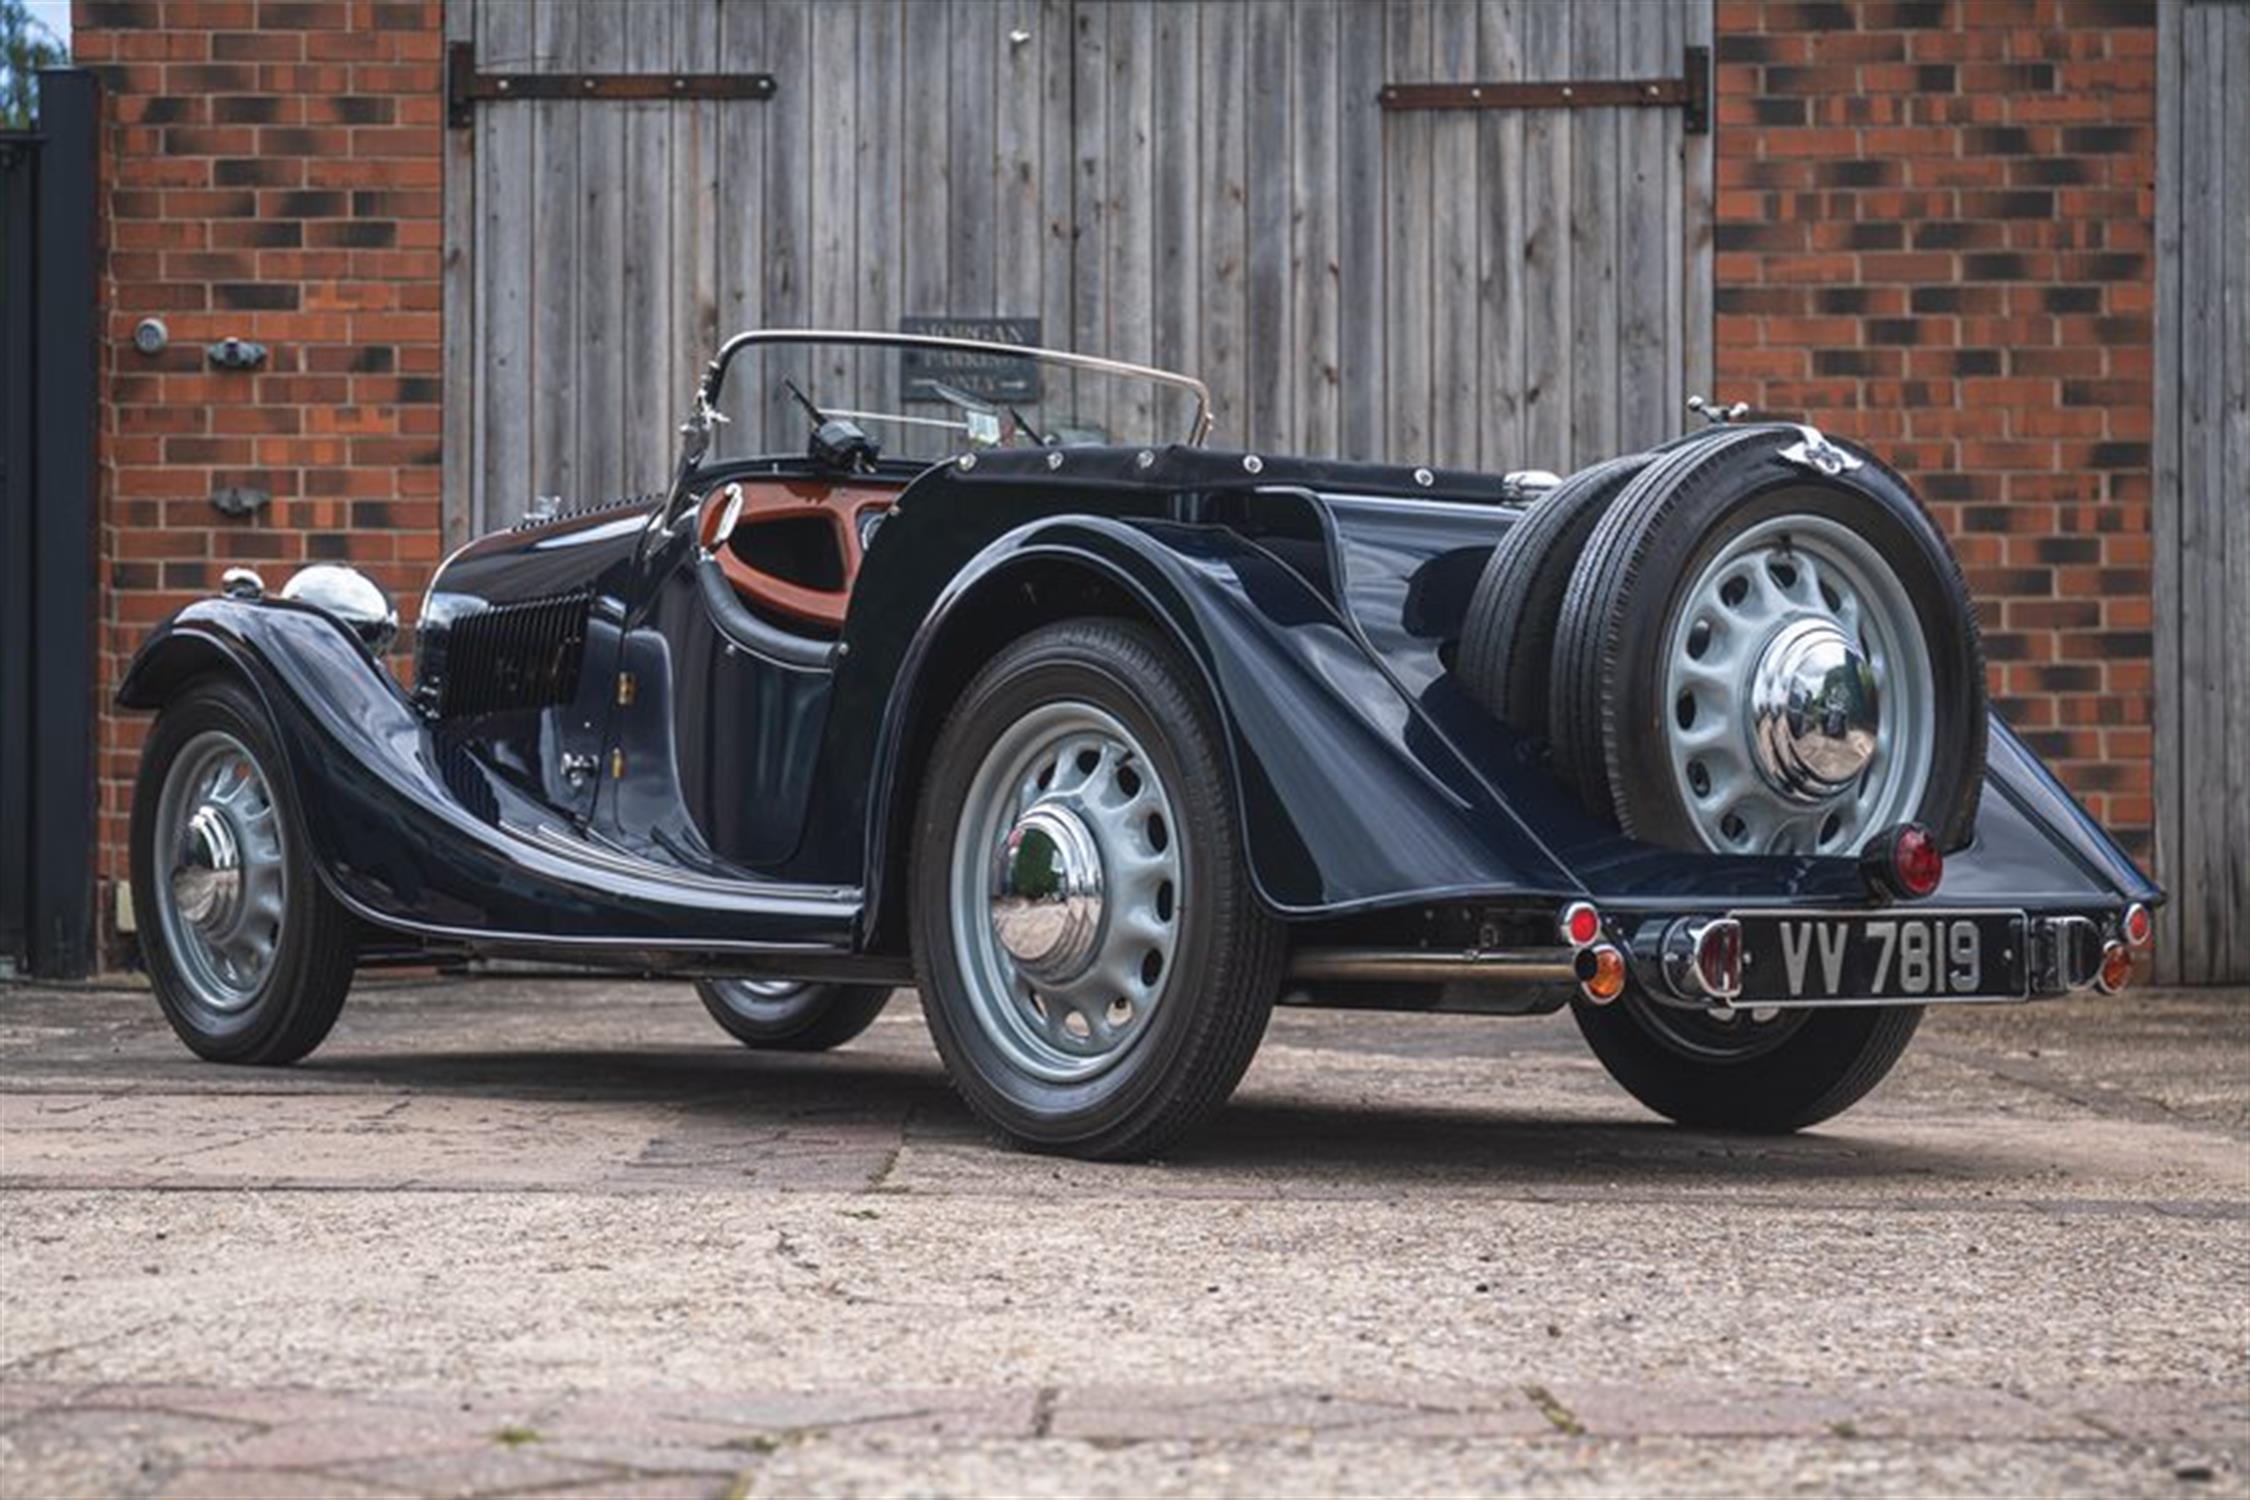 1939 Morgan 4/4 Series 1 'Flat Rad' (1098cc Climax Engine) - Image 5 of 10